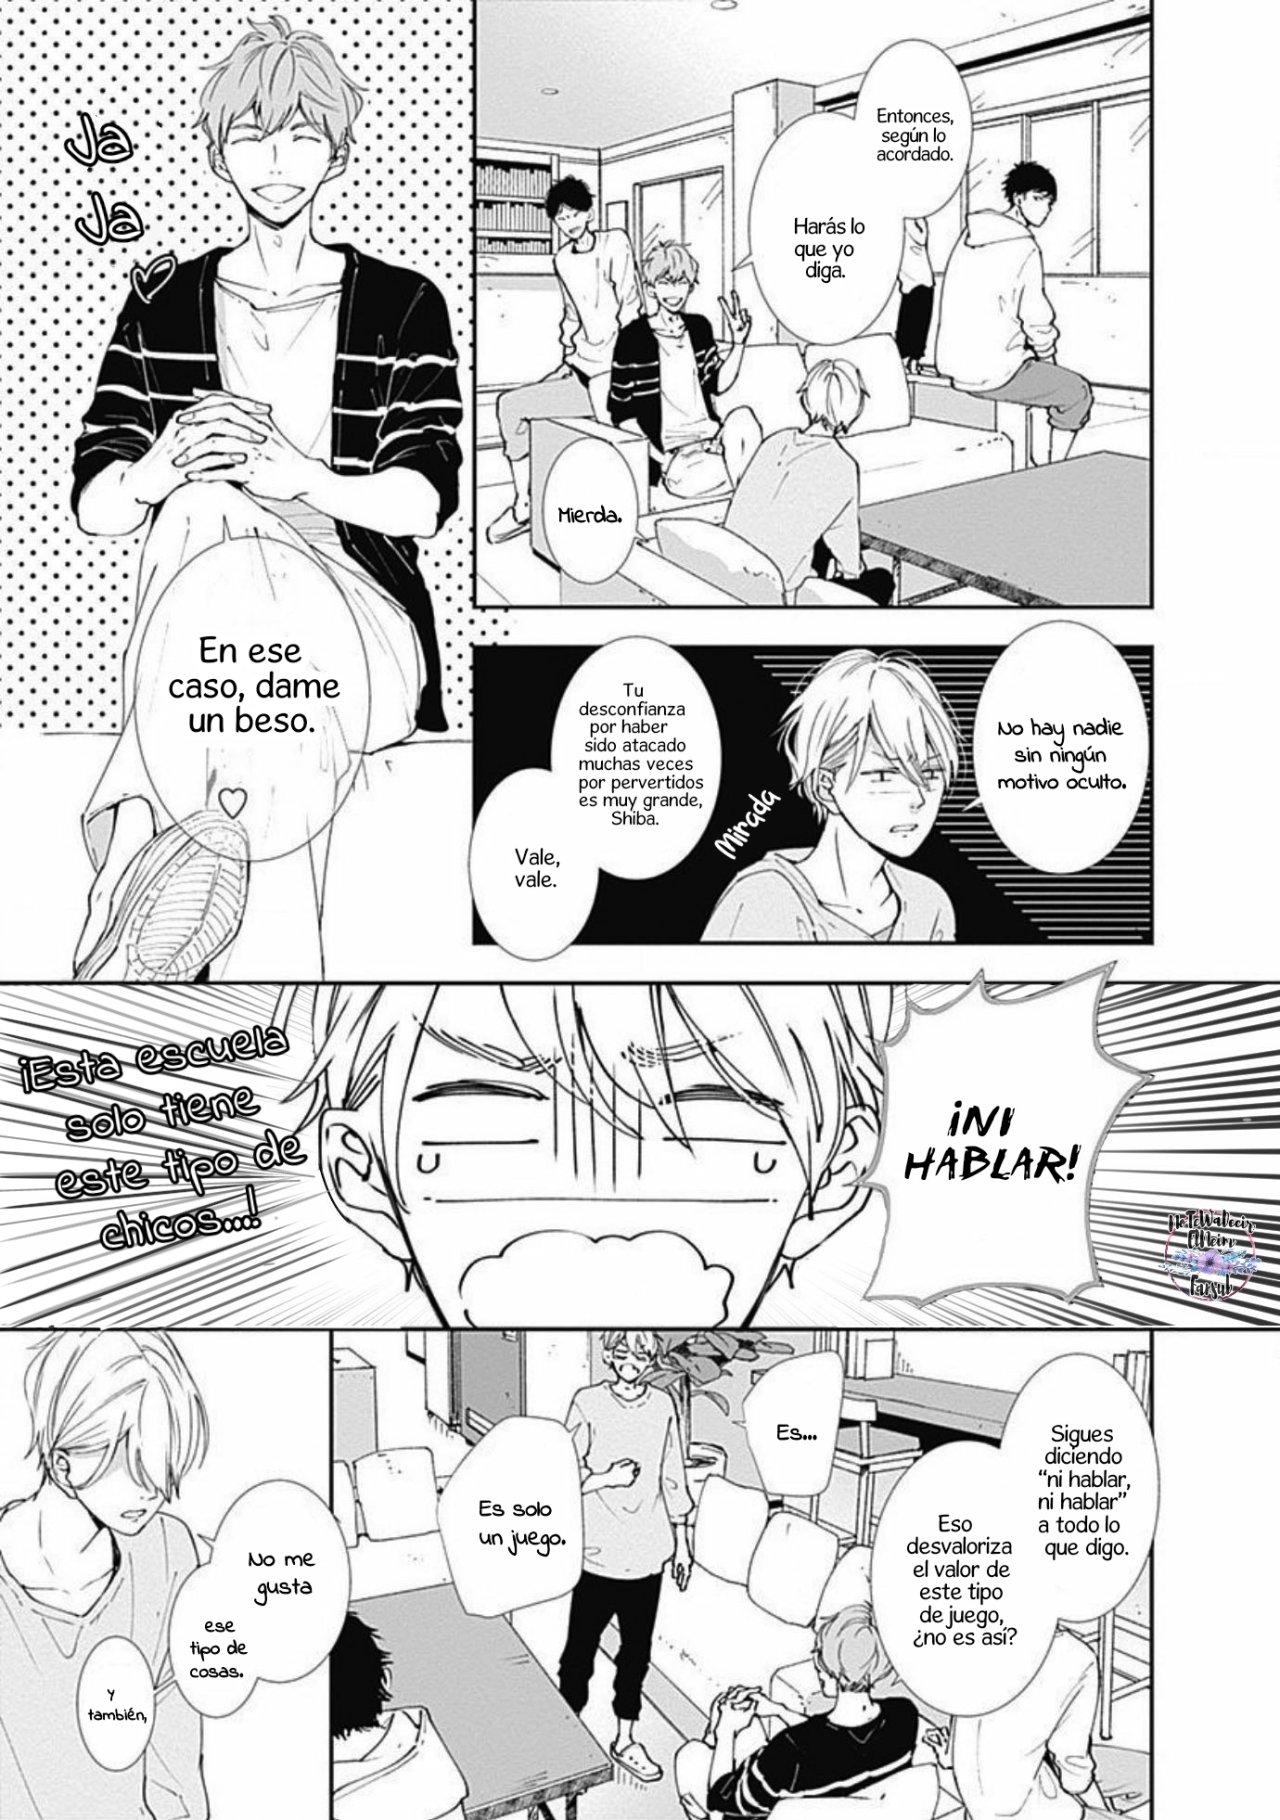 https://nine.mangadogs.com/es_manga/pic8/12/36684/946997/113c2058e052d550d054f82cdcab1f75.jpg Page 34